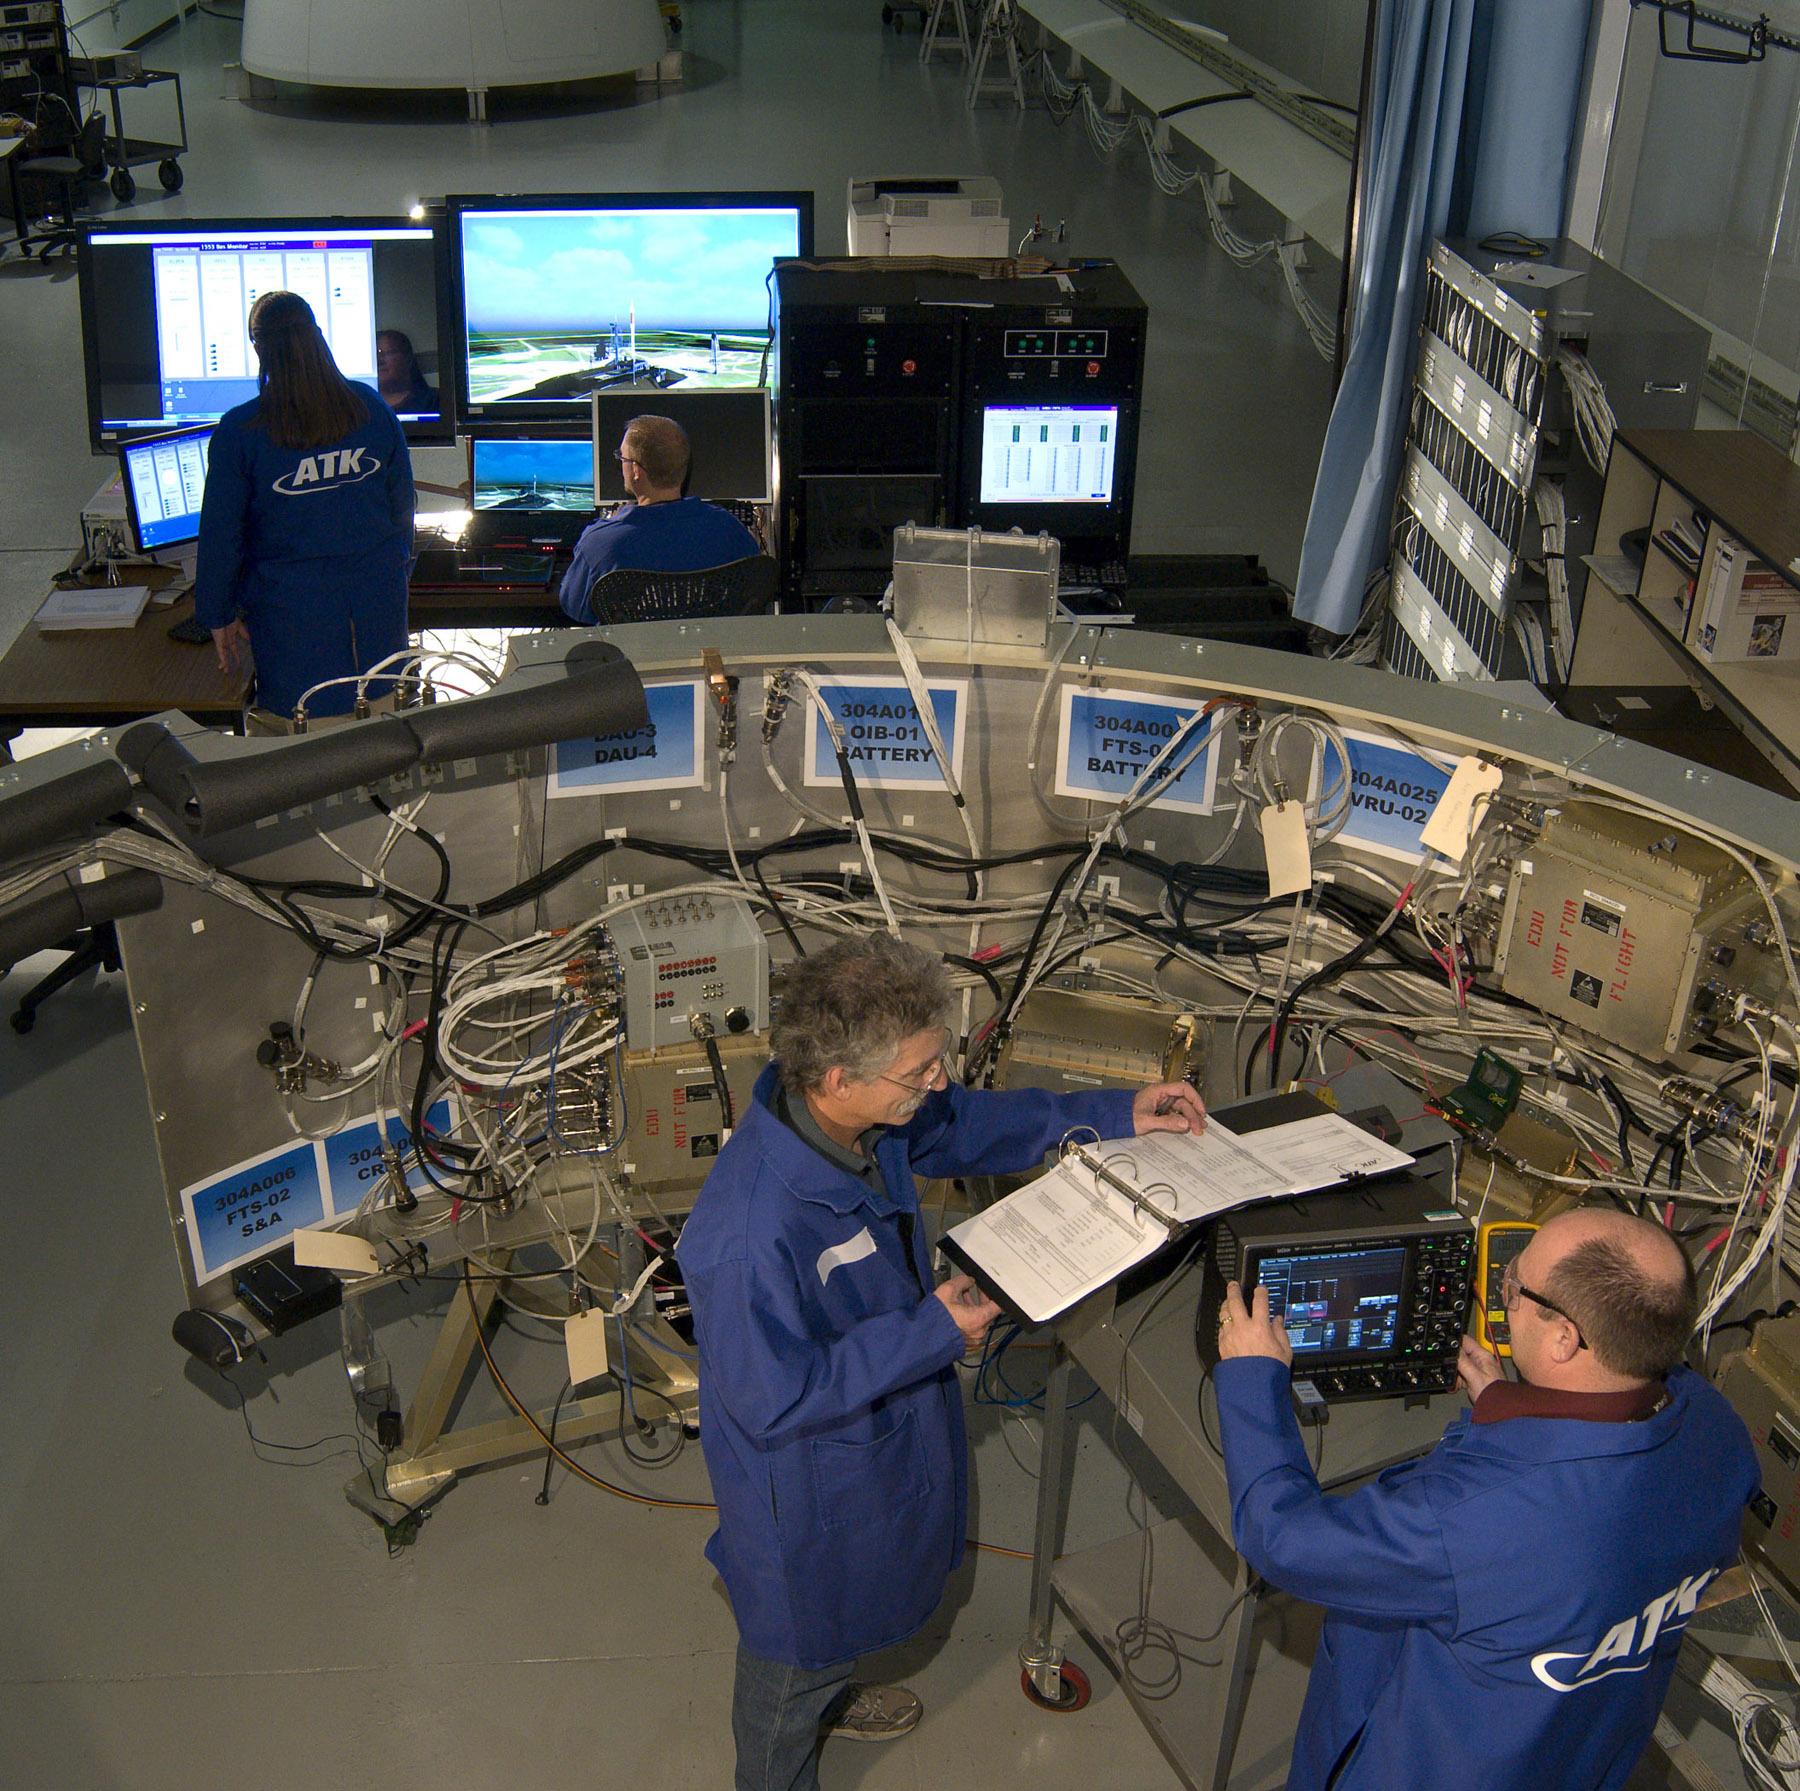 ATK's Liberty Rocket Avionics Lab